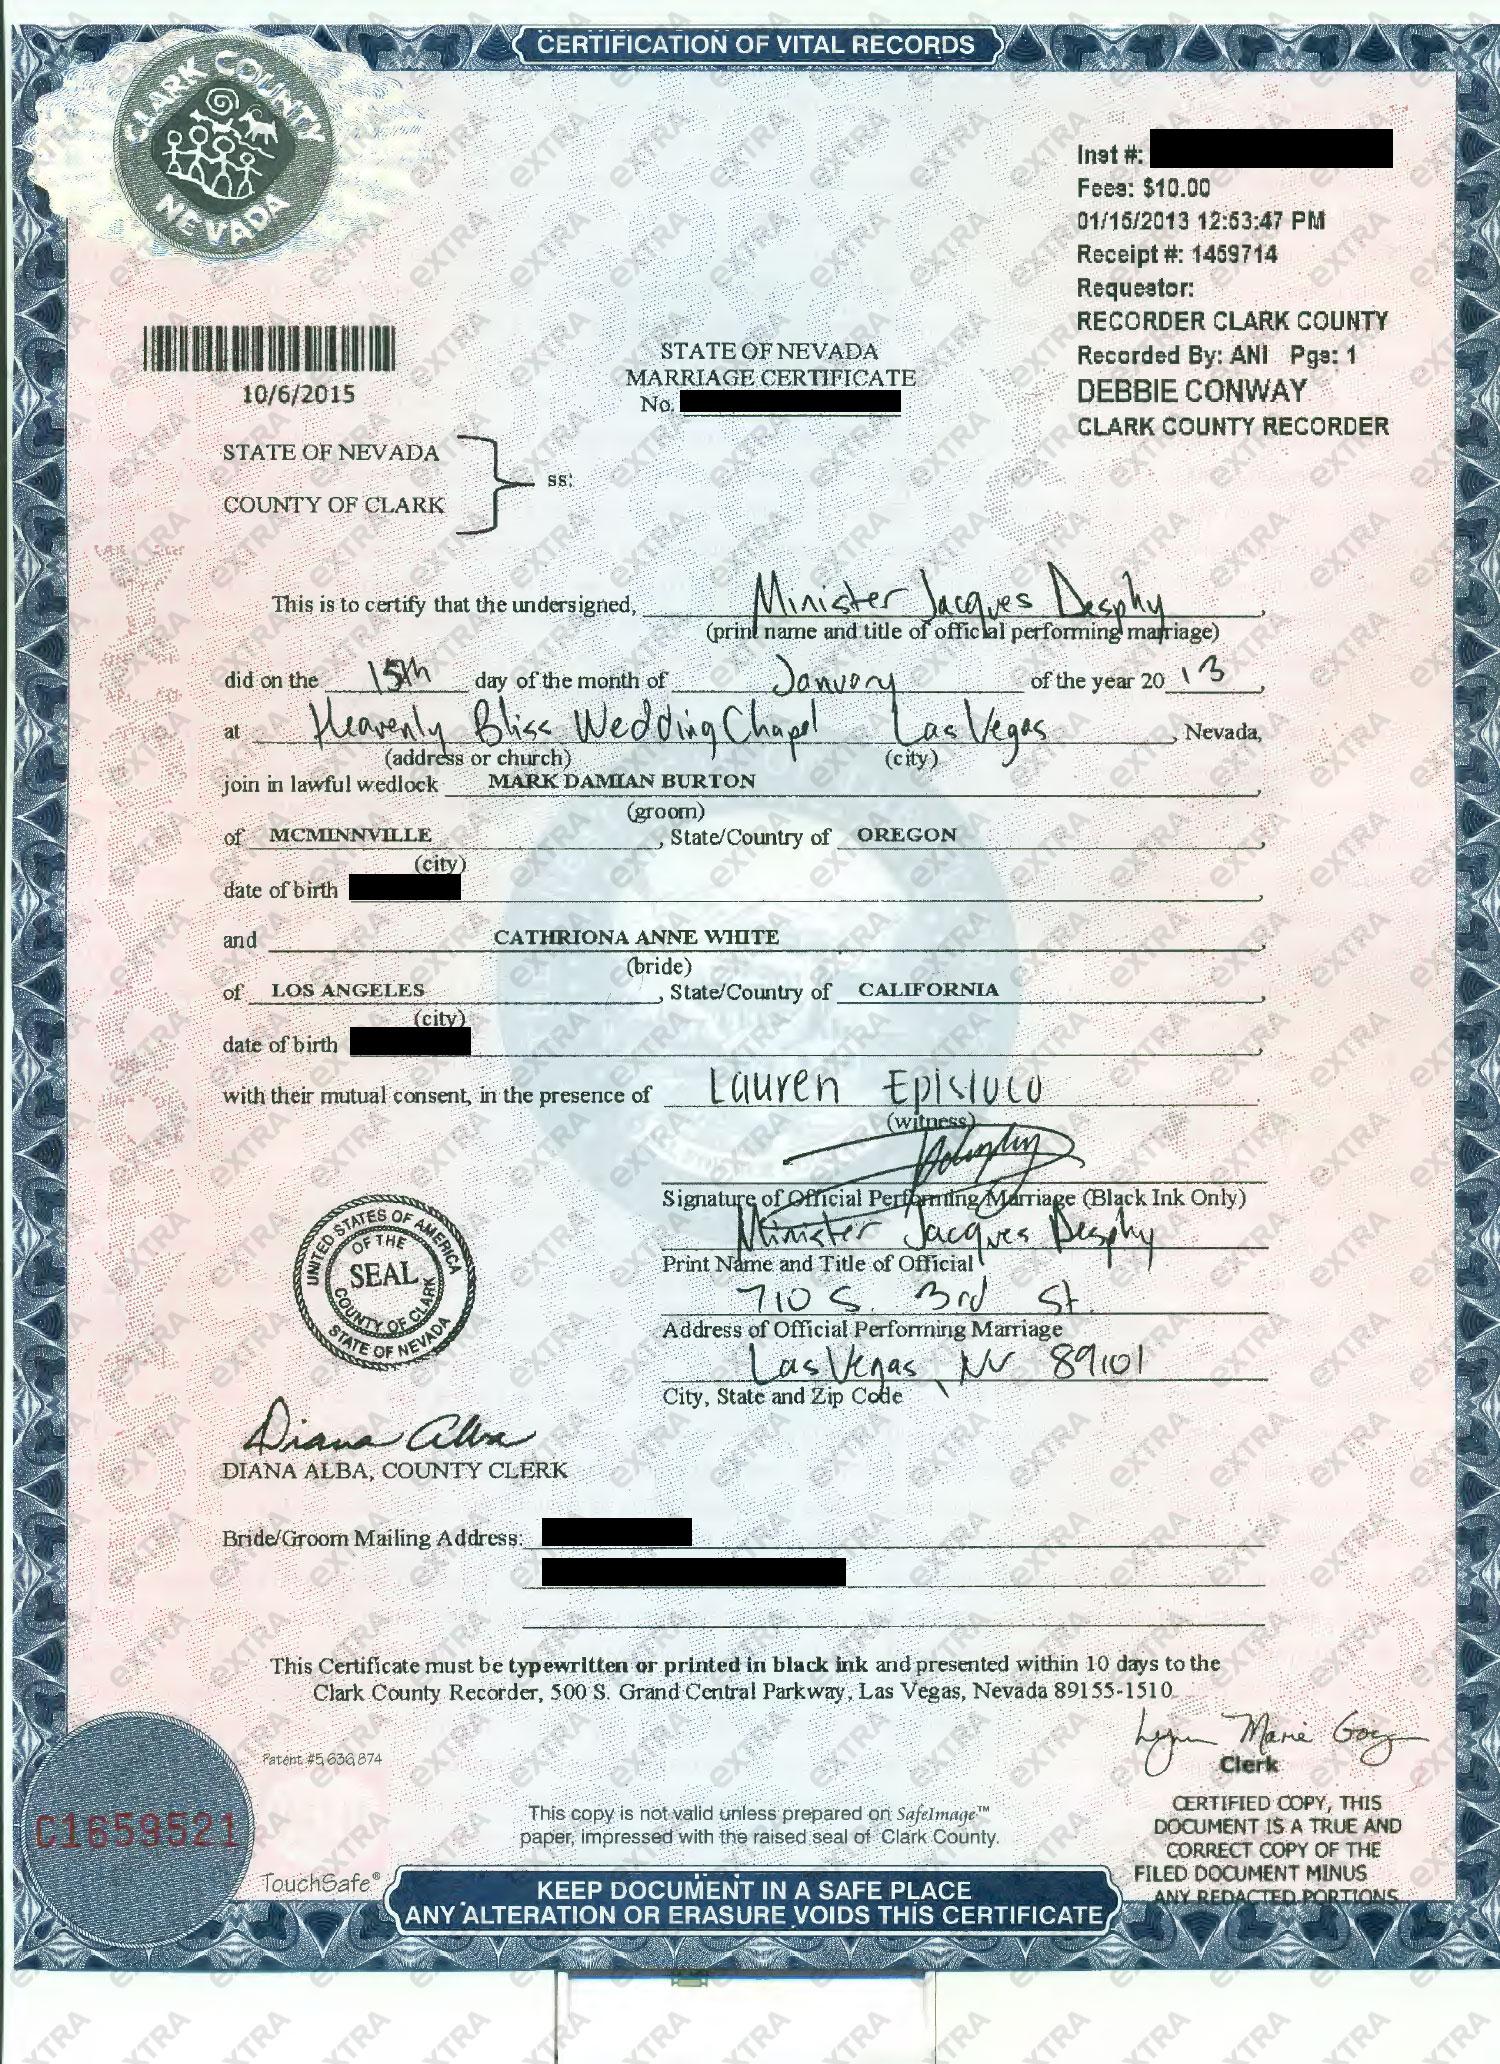 Las Vegas Marriage License Record Sample Certificates Nevada